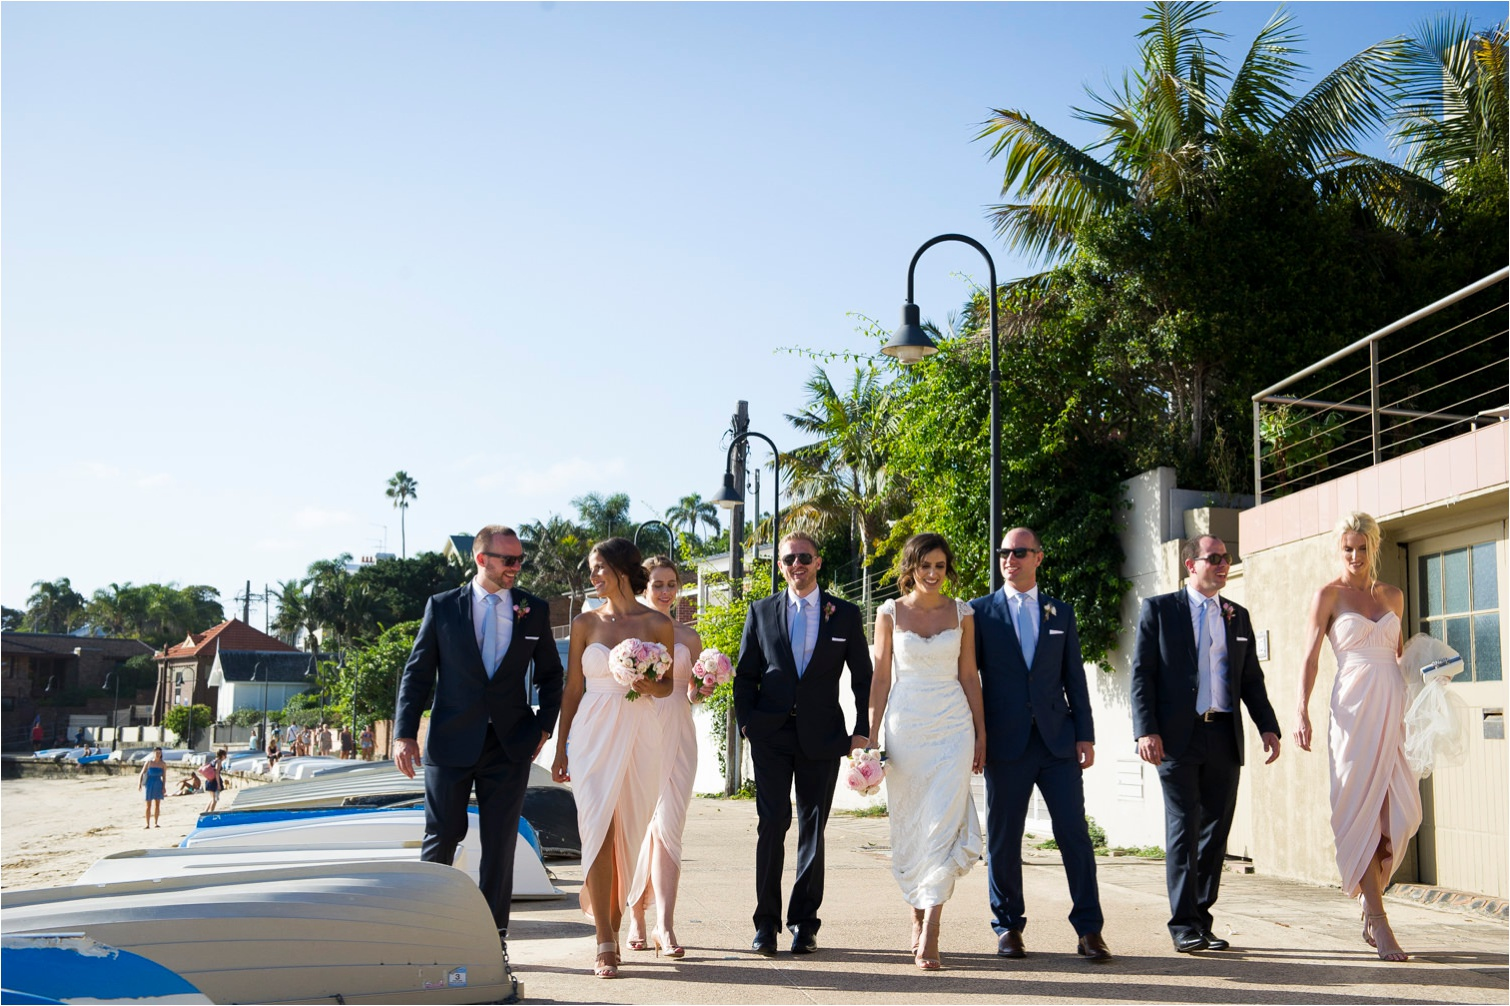 Nicole&Carlie_Watsons_Bay_Hotel_Wedding_by_Gold_Coast_Photographers-The_Follans42.jpg